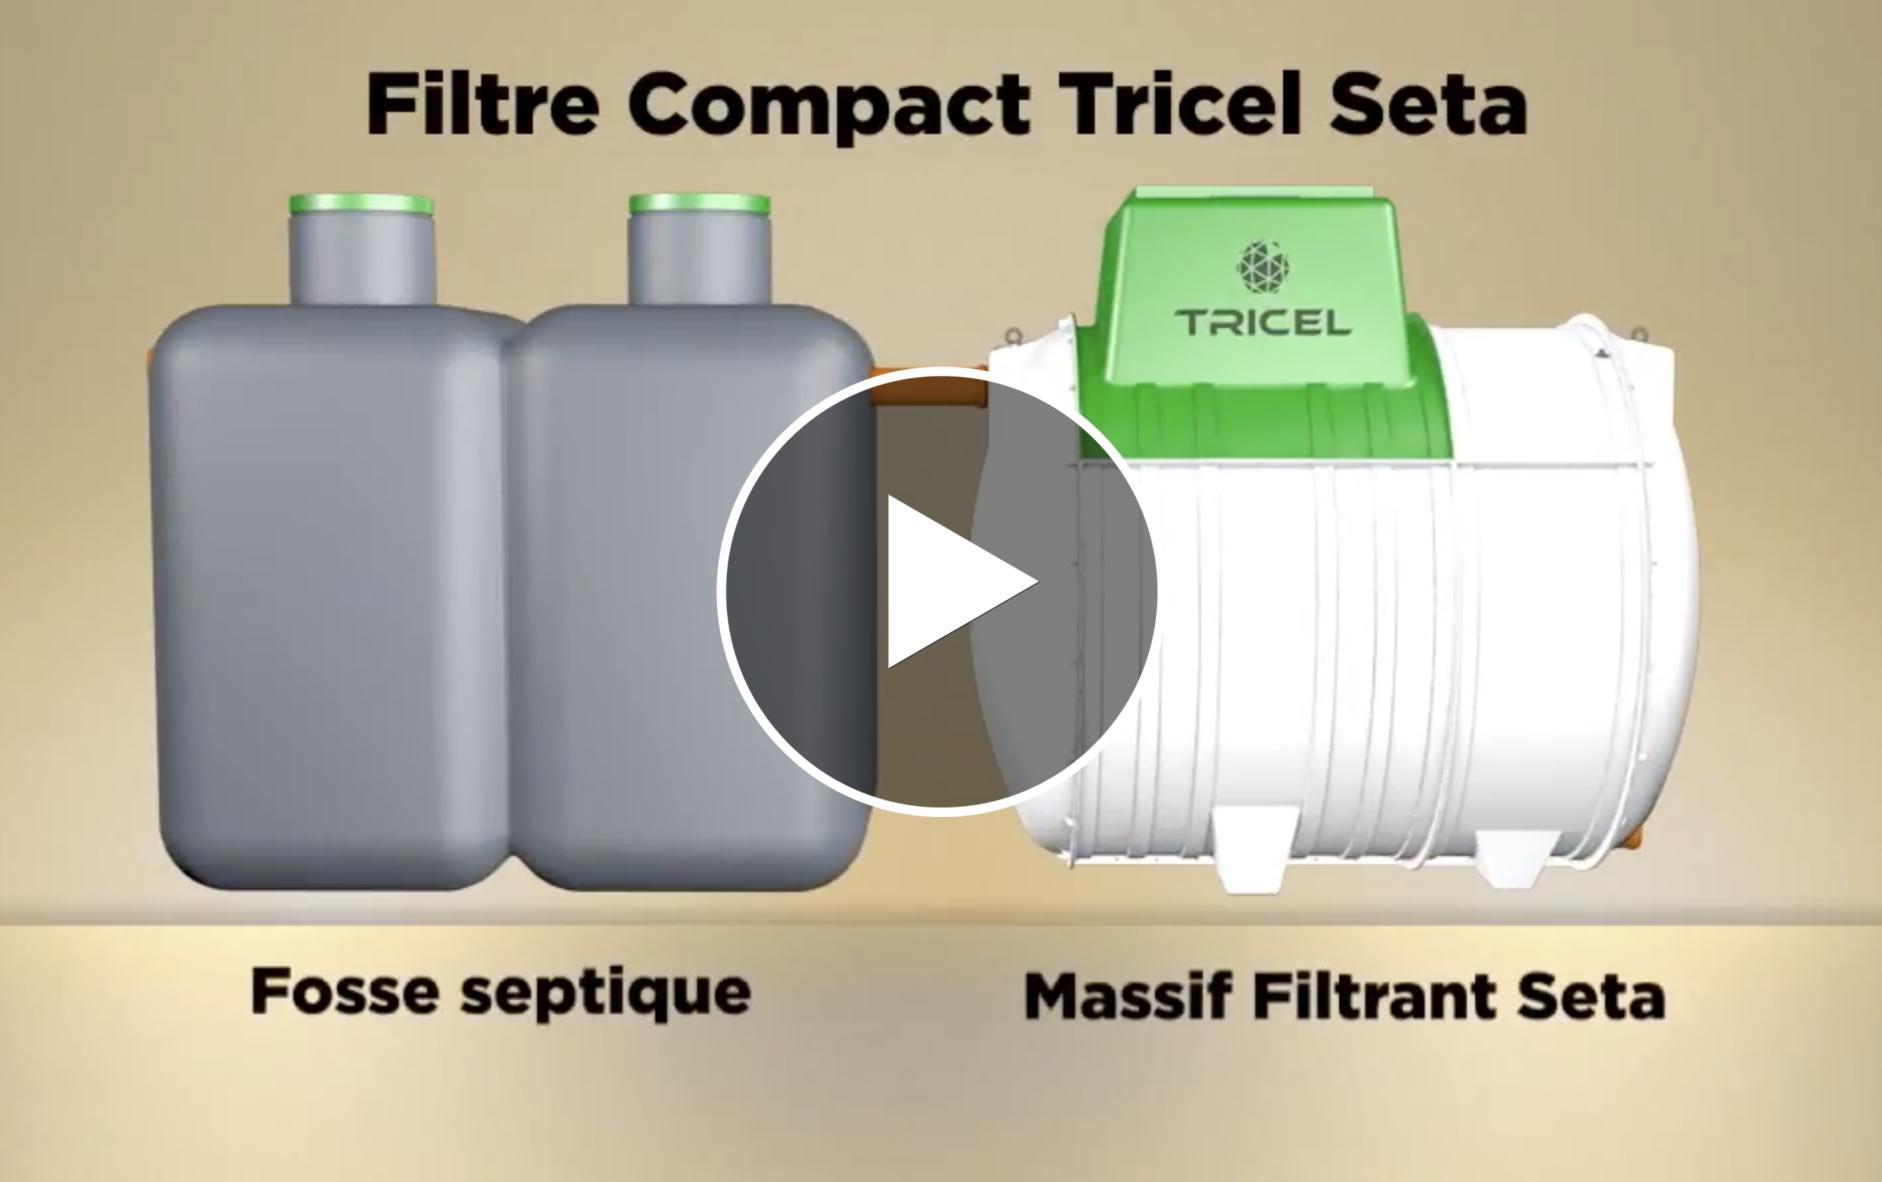 Tricel Seta Compact Filter Demonstration